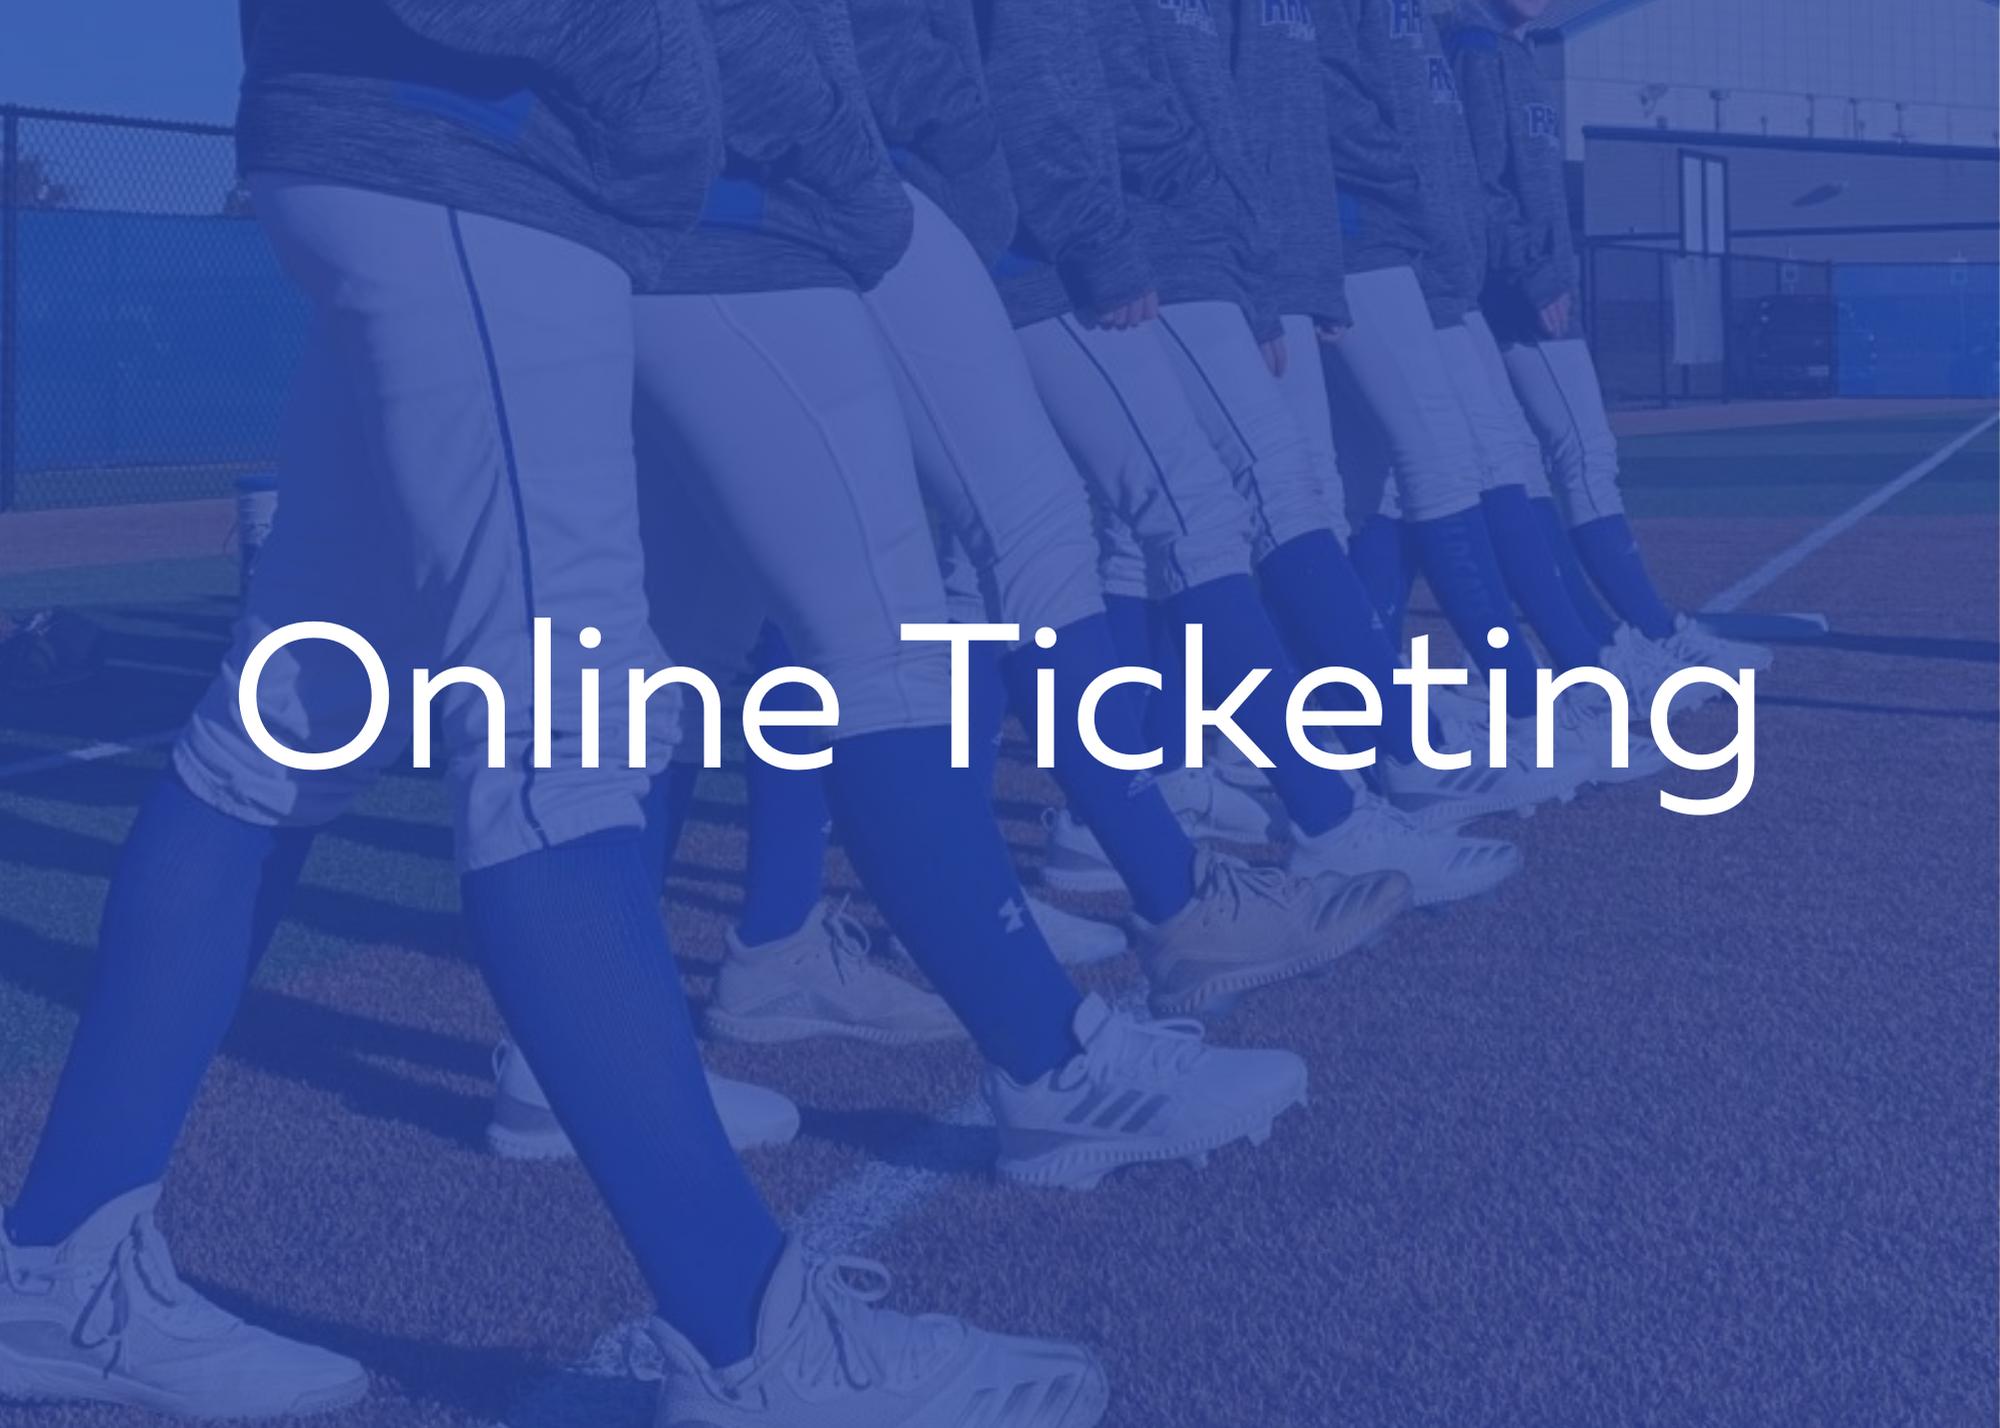 Online Ticketing Link